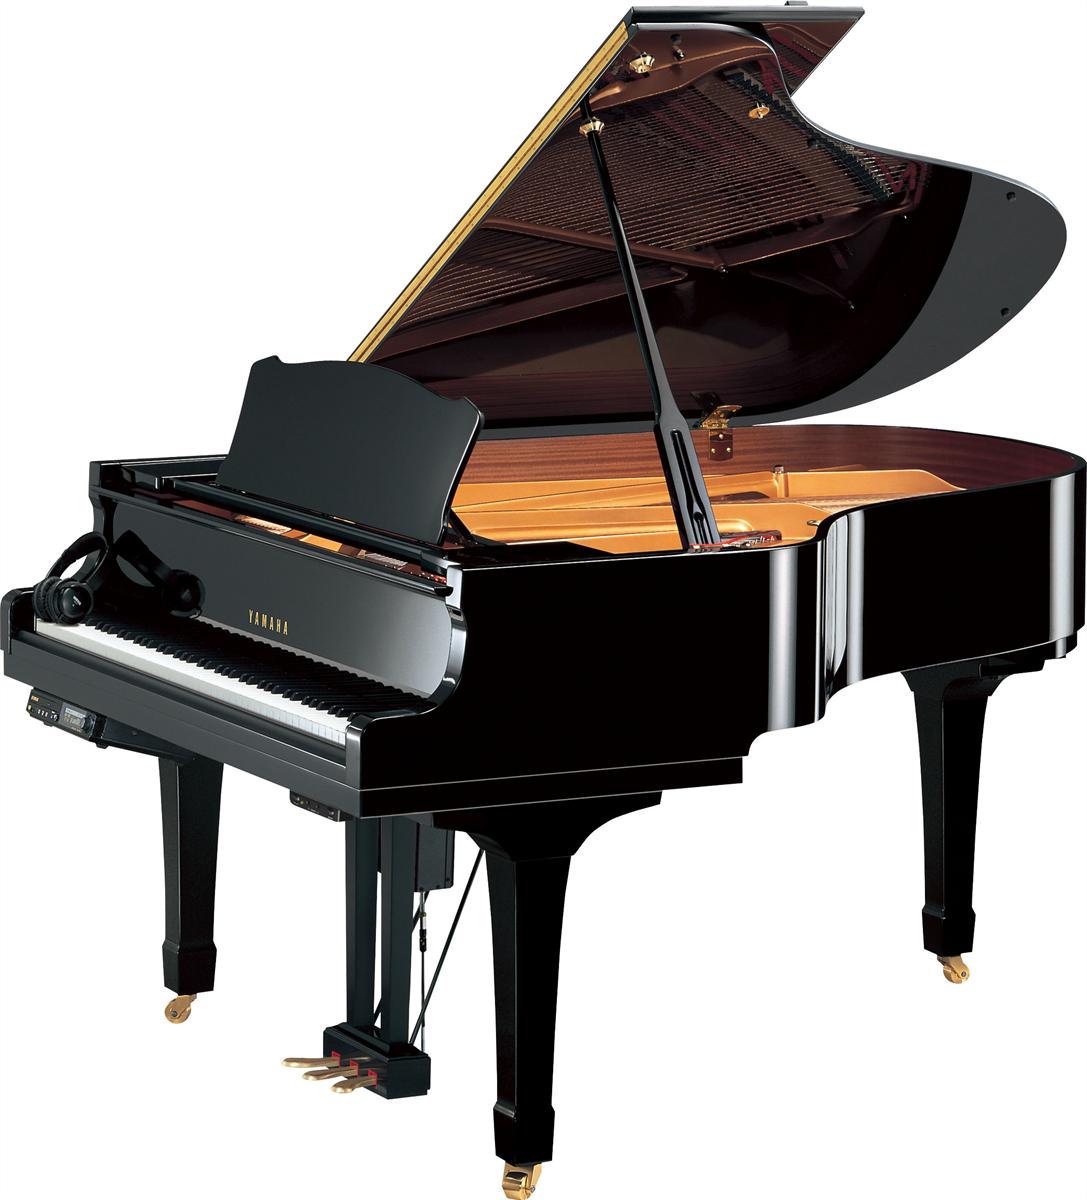 Lemca disklavier yamaha dc3x enspire pro disklavier for Yamaha disklavier grand piano